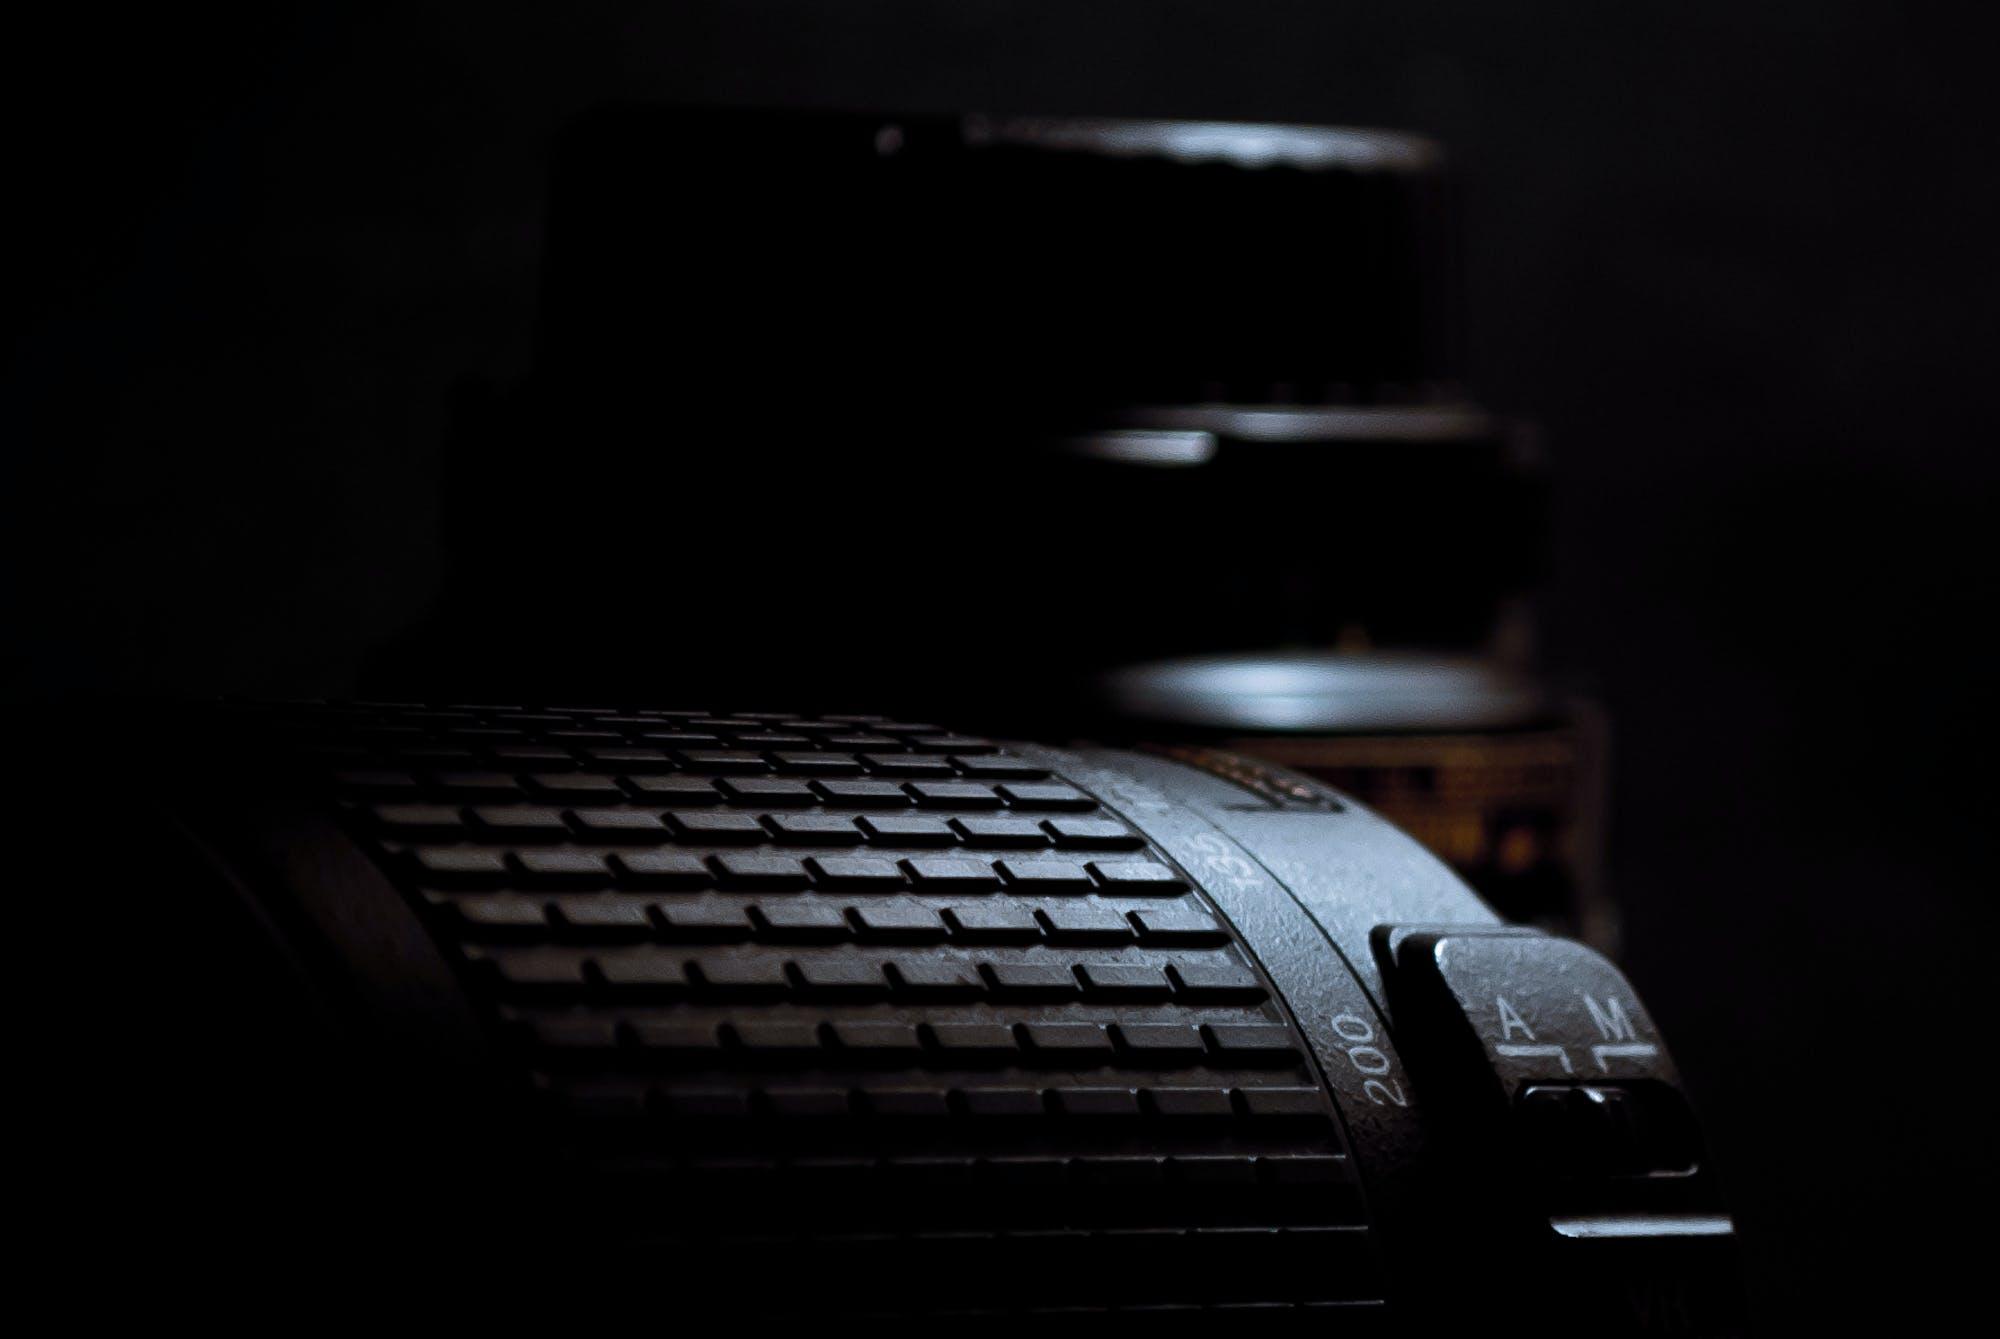 Free stock photo of light, dark, technology, blur